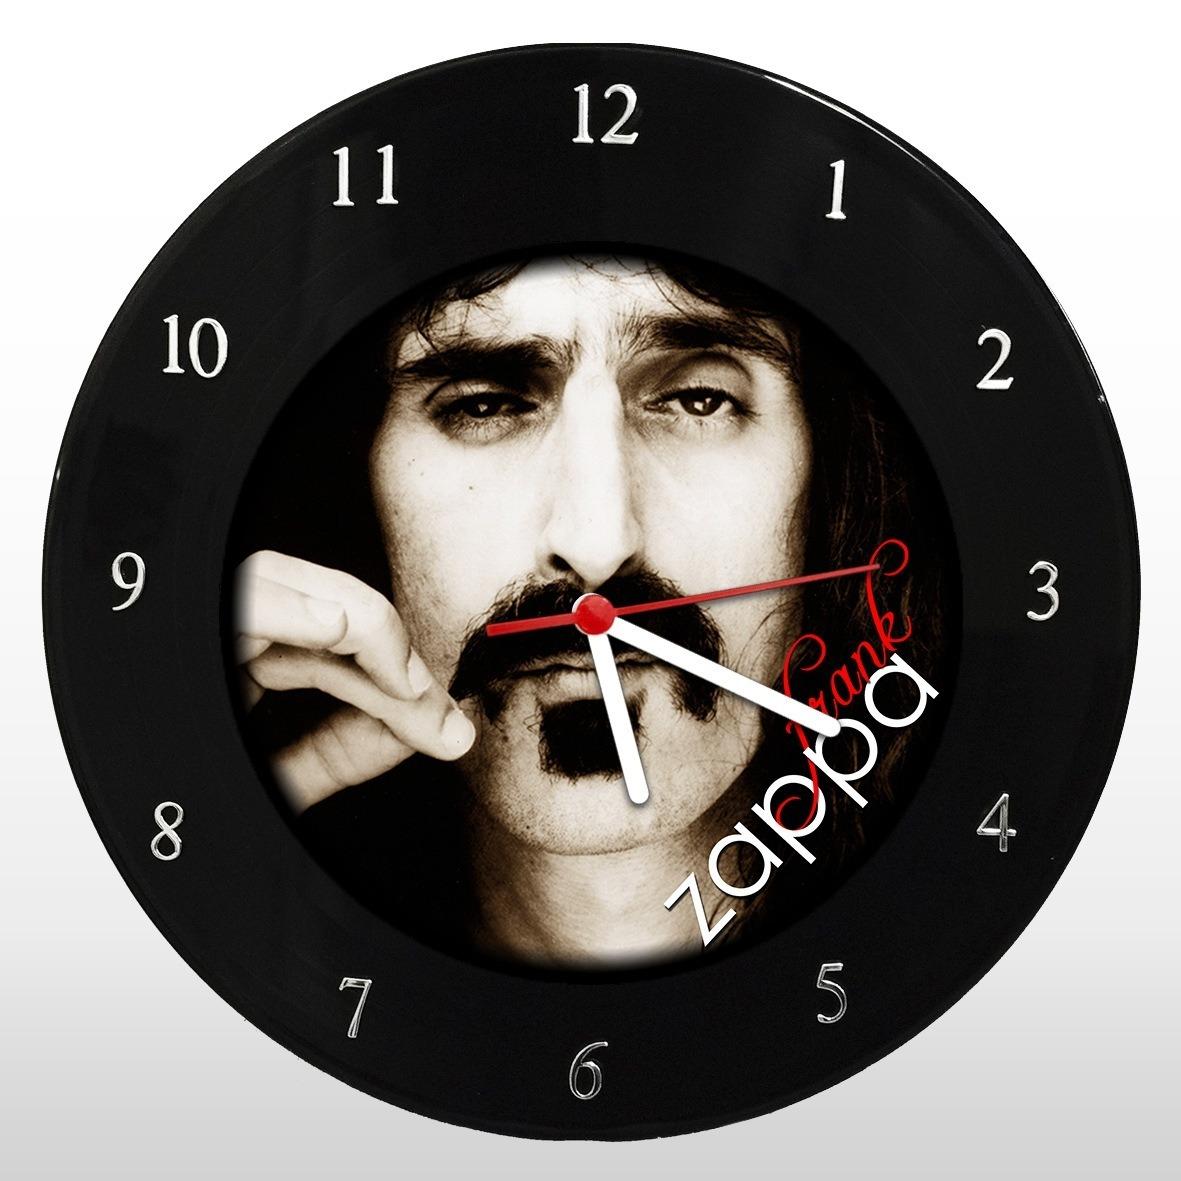 Frank Zappa - Relógio de Parede em Disco de Vinil - Mr. Rock